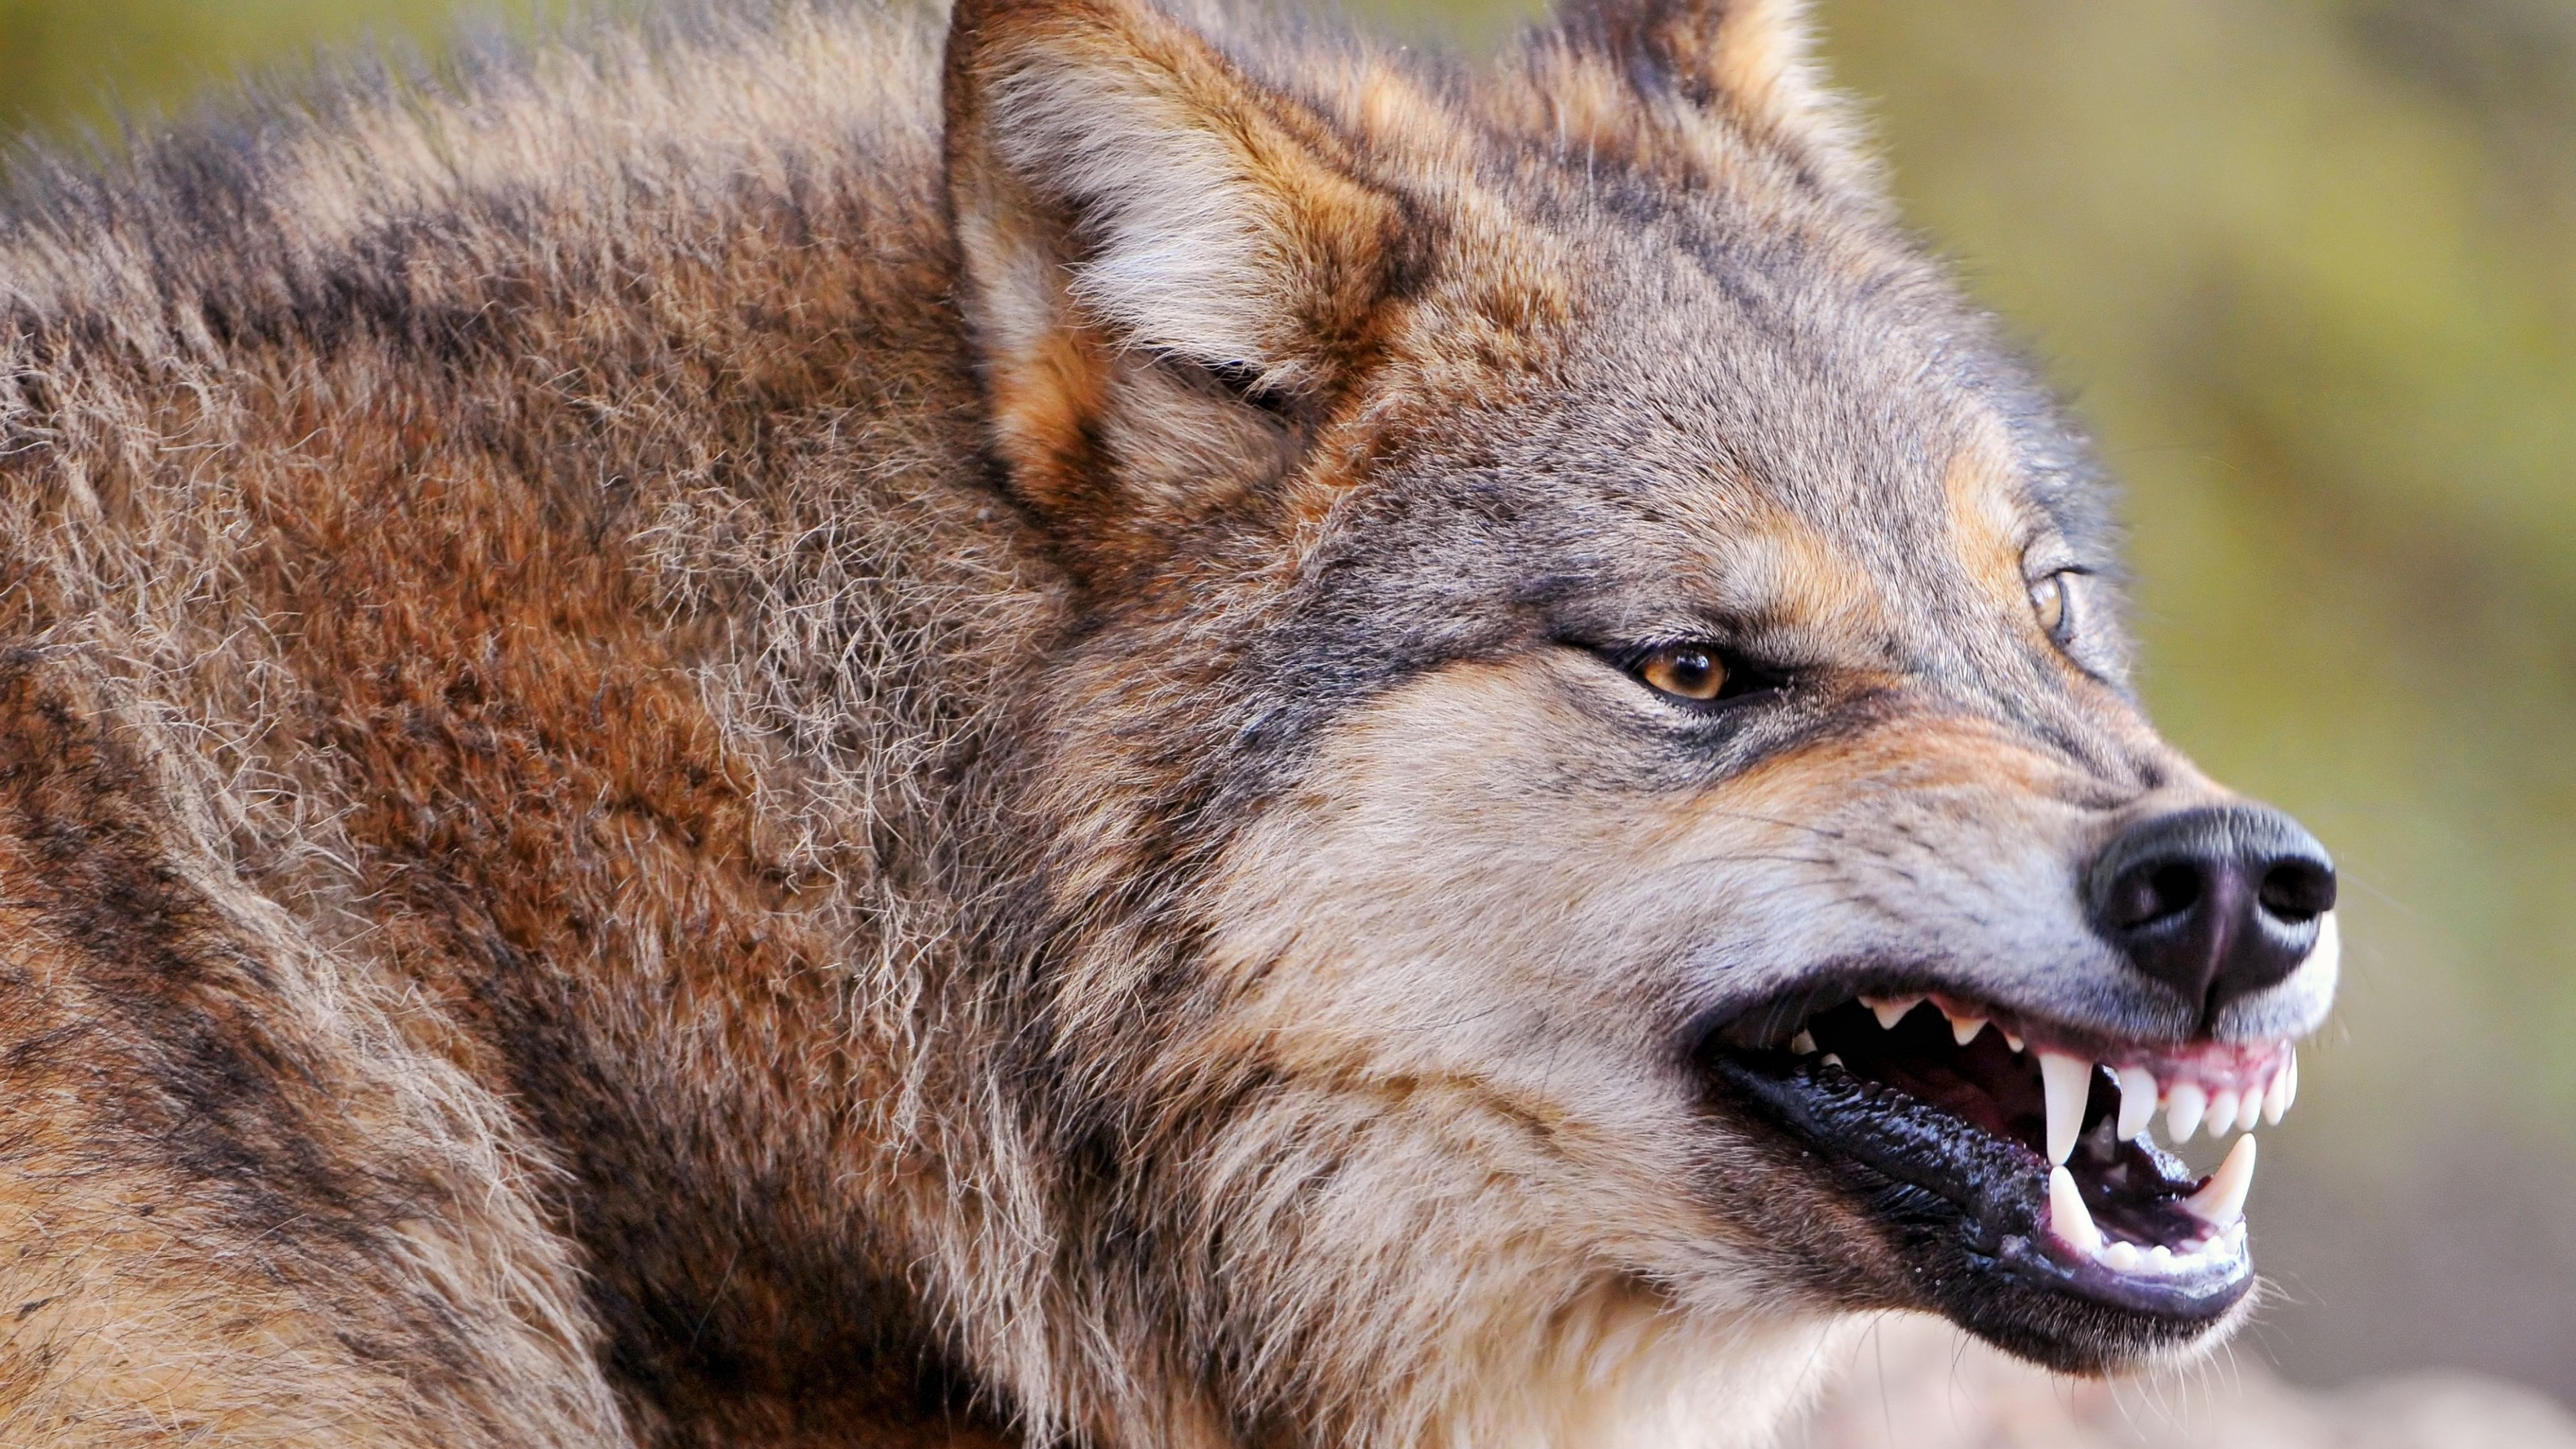 HD Wallpaper 38402160 wolf face teeth aggression predator 4K 3840x2160